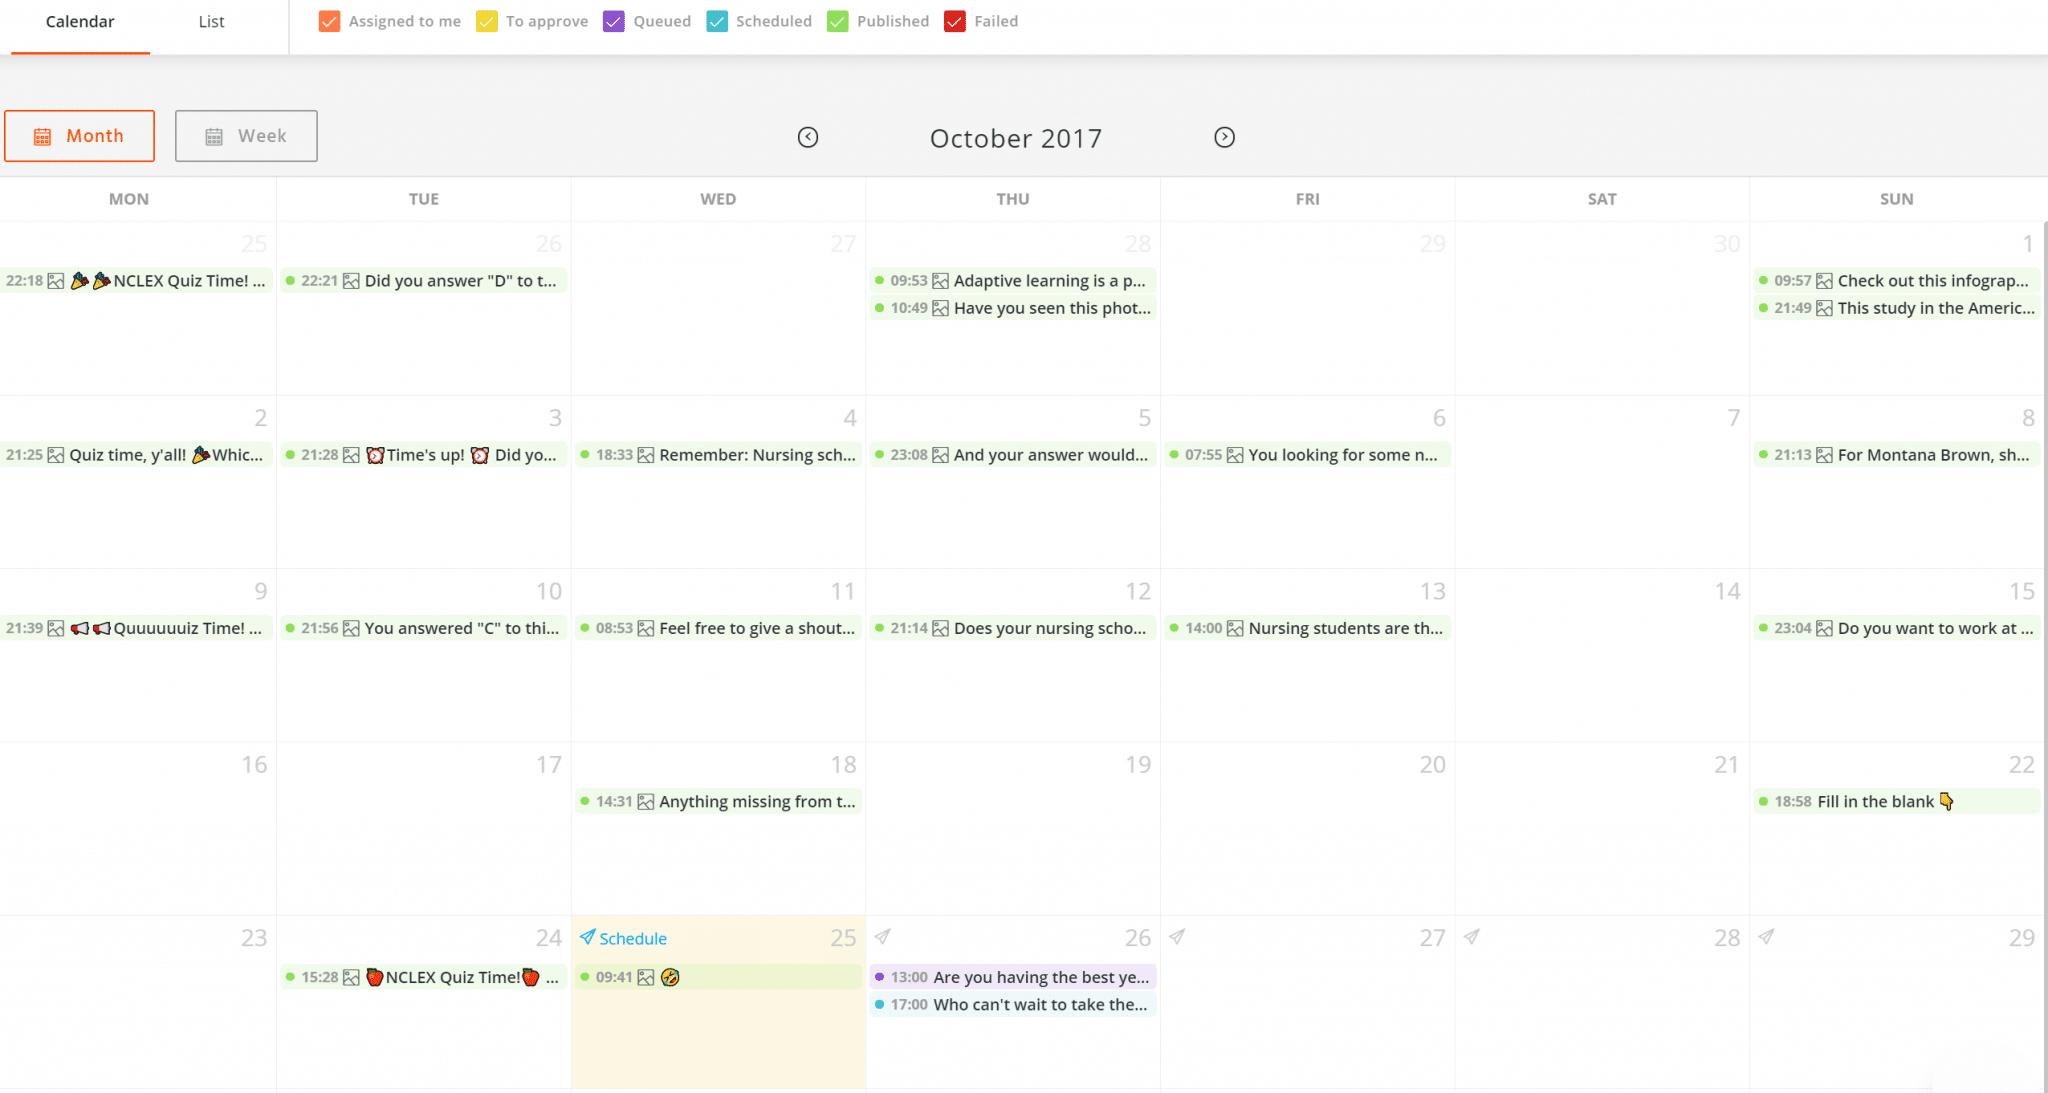 facebook-content-calendar